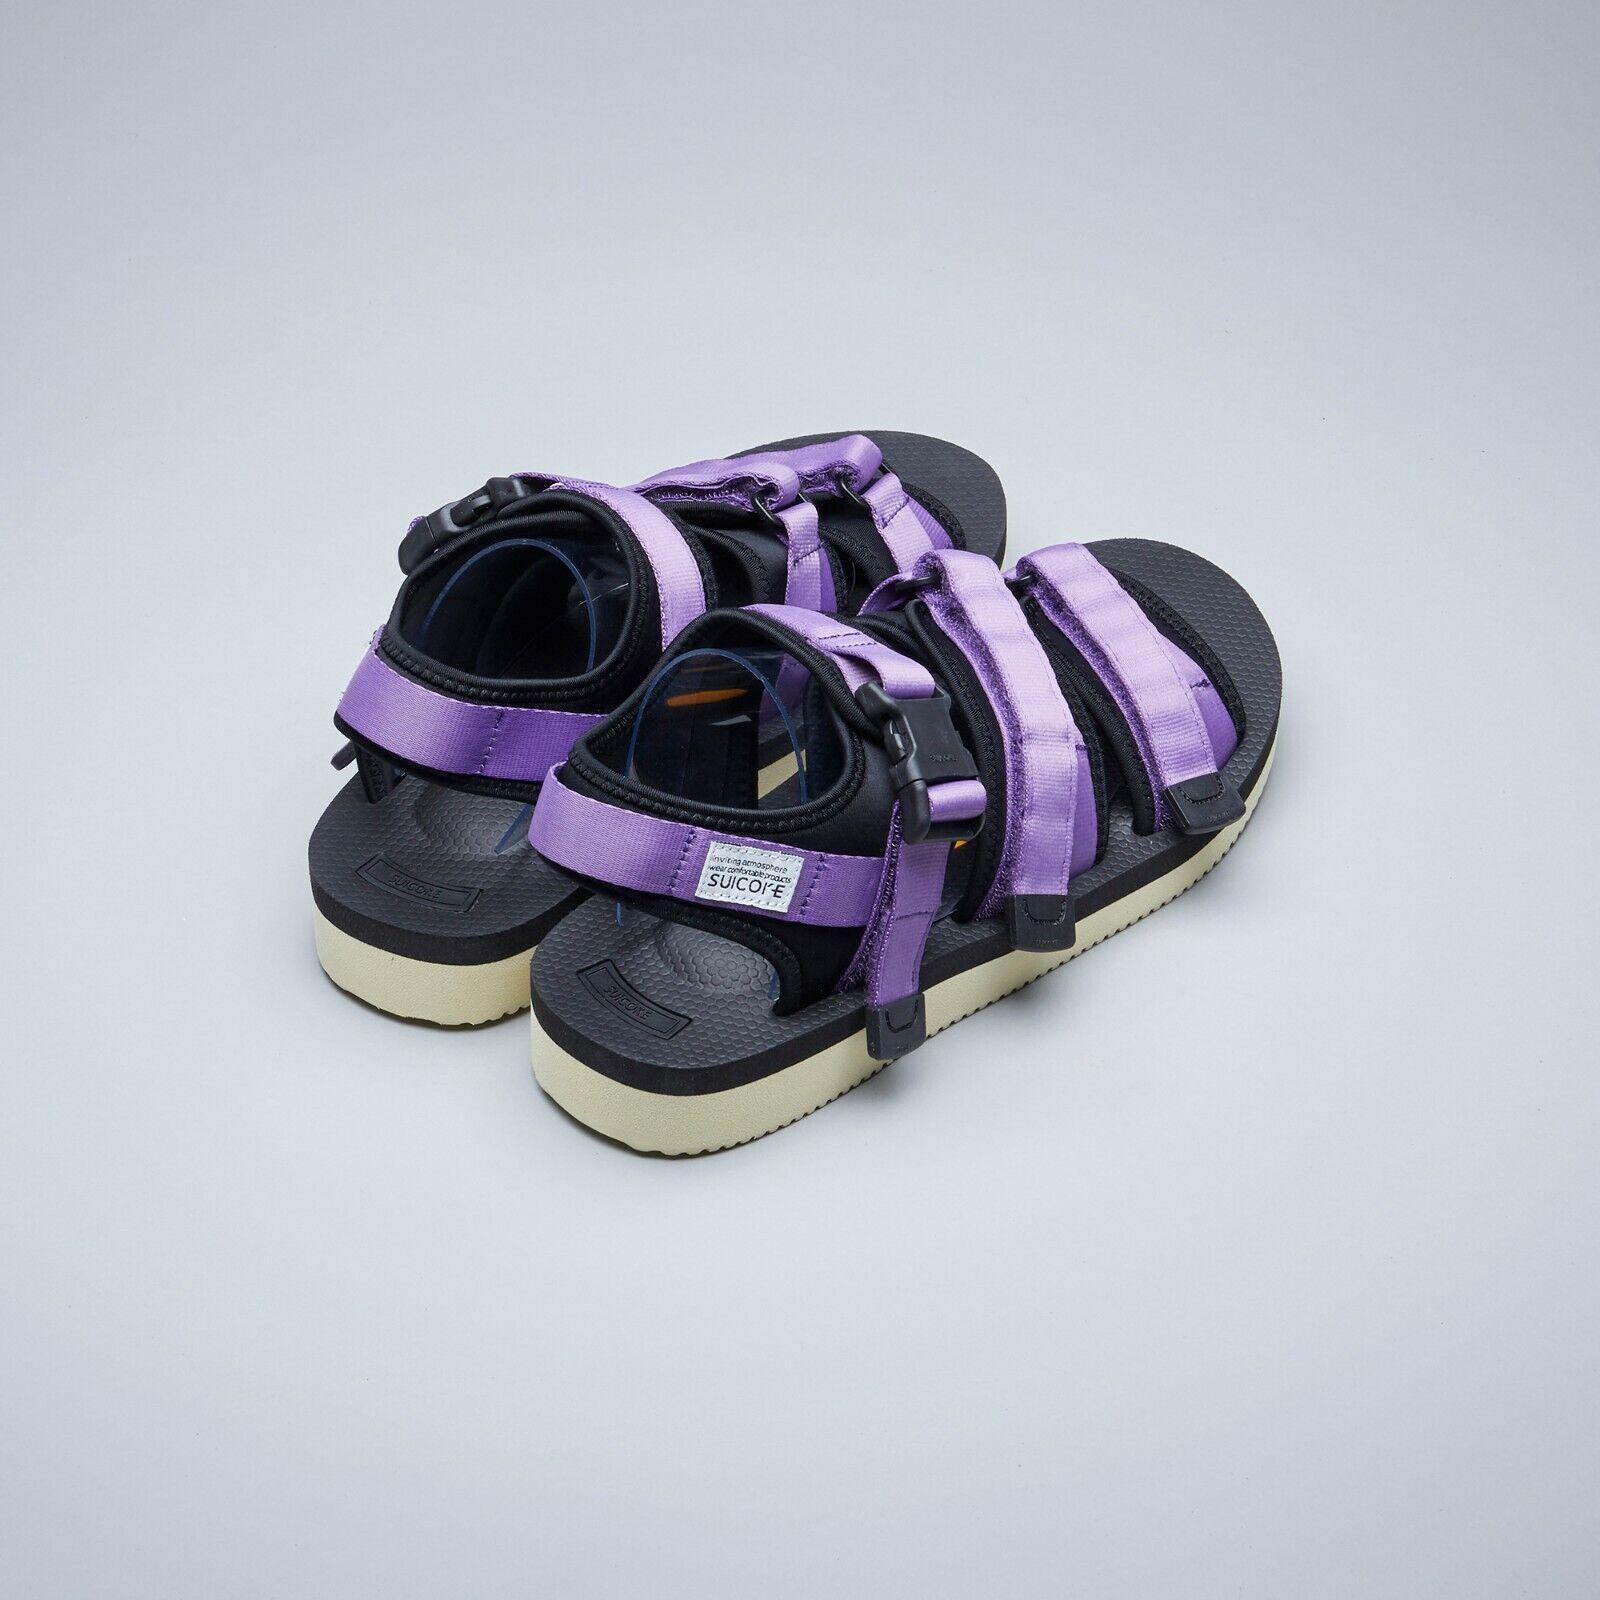 Suicoke SS19 OG-052V   GGA-V viola Vibram adjustable Nylon Nylon Nylon Tapes Sandals Slides 16bd92